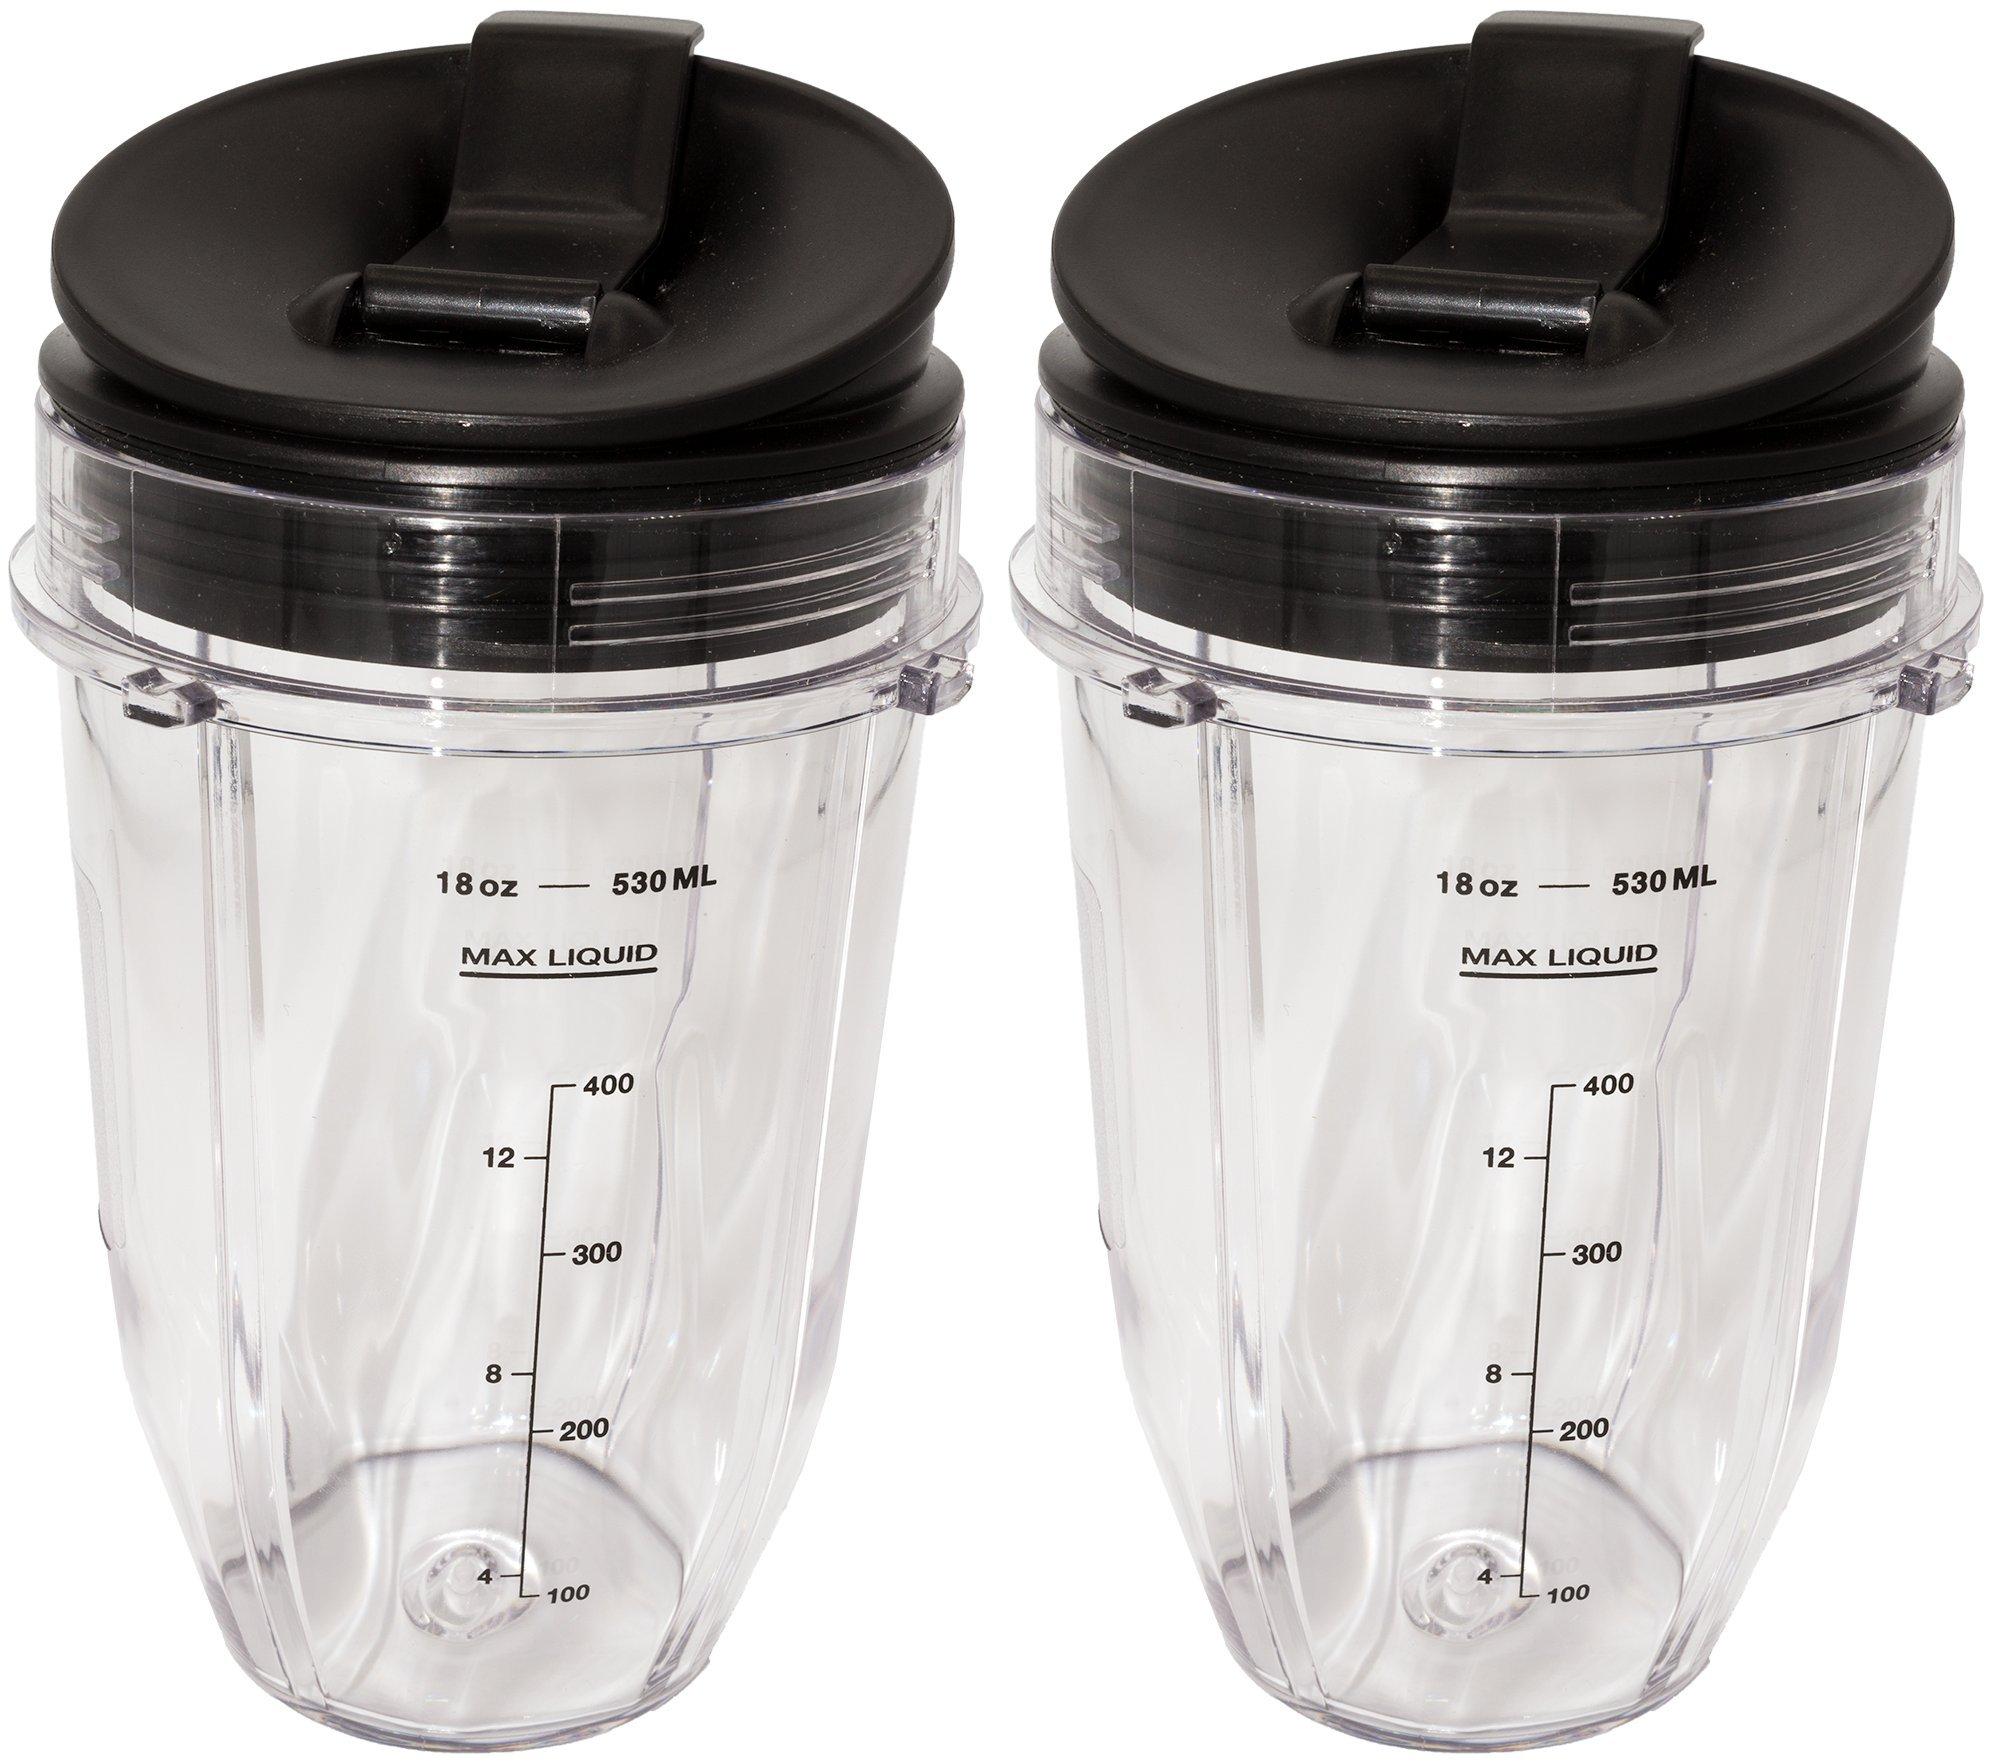 Blendin 2 Pack Small 18 Ounce Cup with Sip N Seal Flip Lids, Fits Nutri Ninja Auto-iQ 1000w Series Blenders